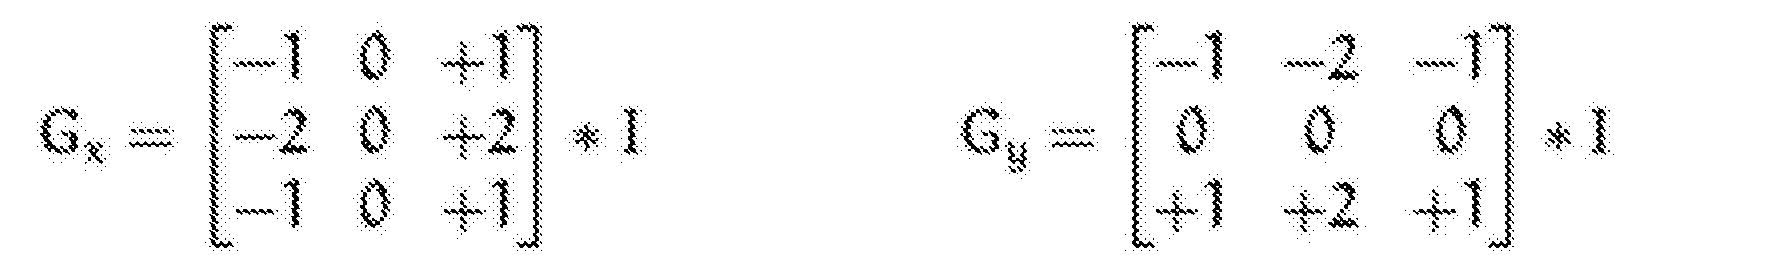 Figure CN108195529AD00102